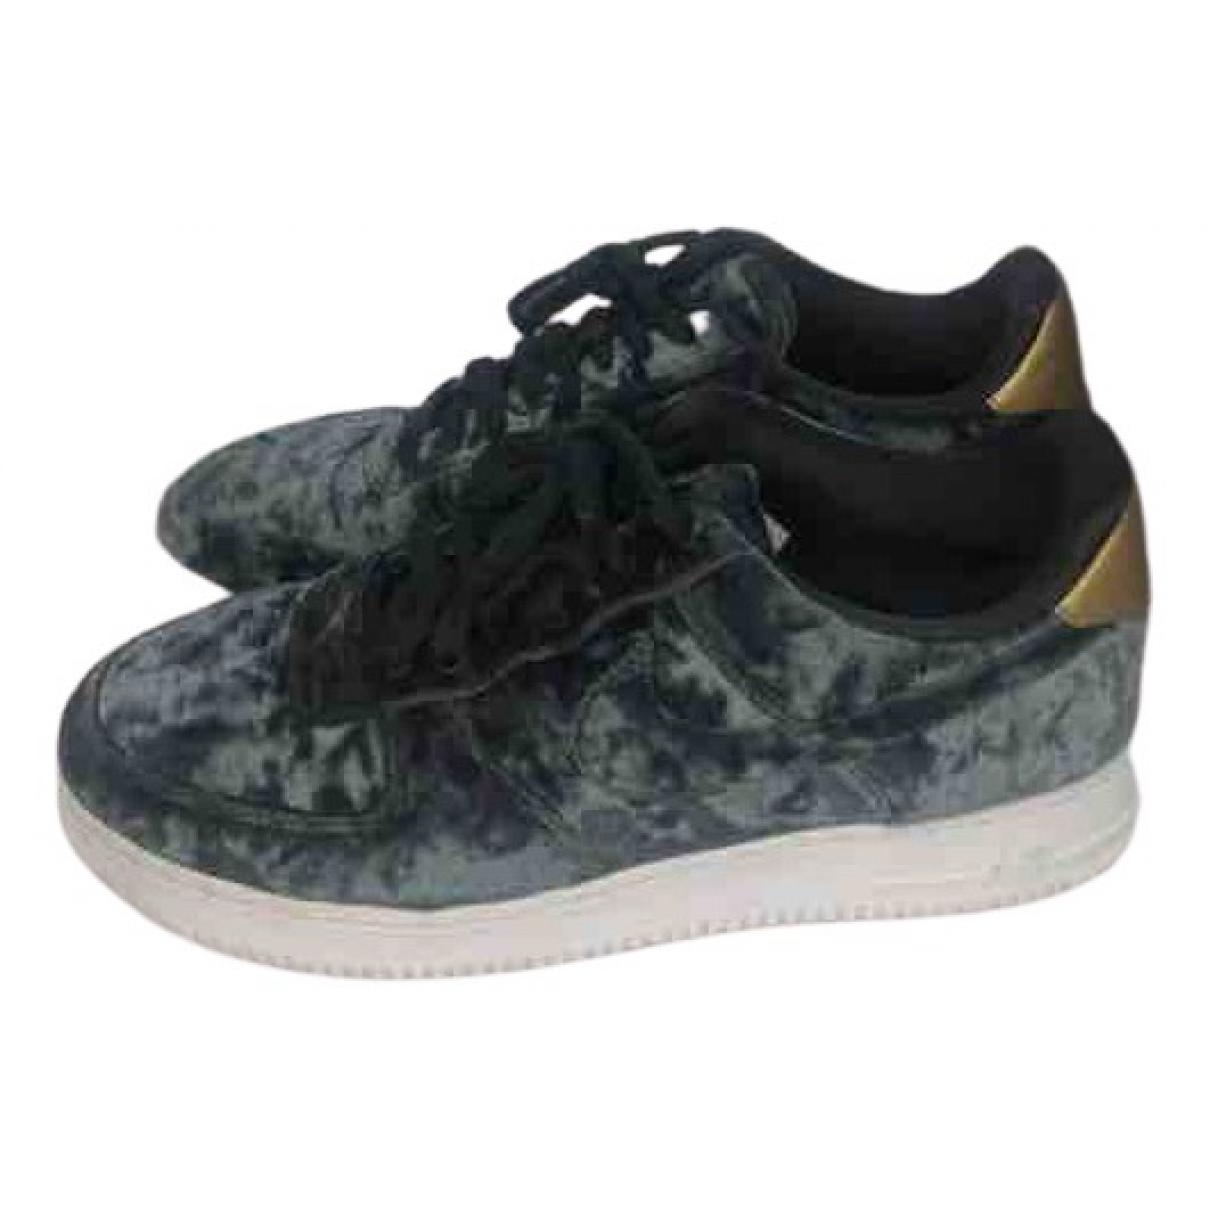 Nike Air Force 1 Green Velvet Trainers for Women 41 EU